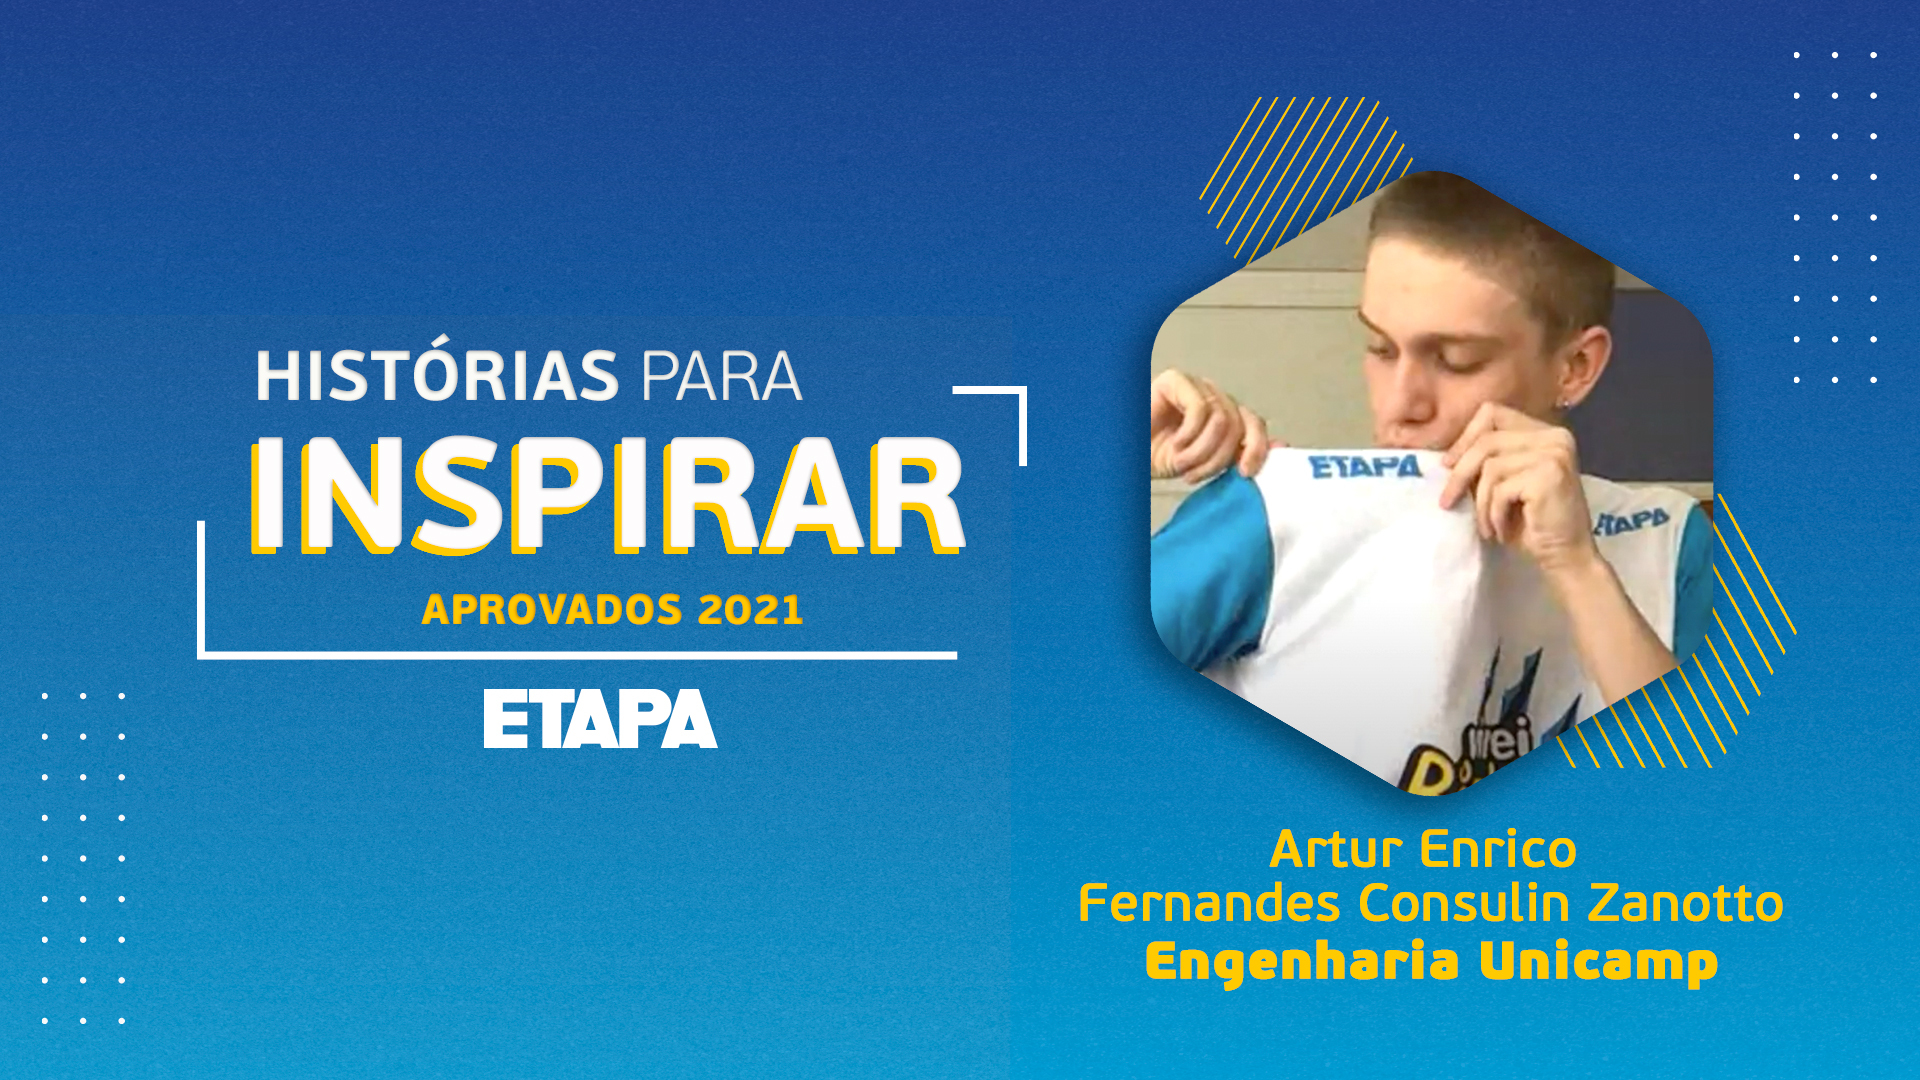 Histórias para inspirar: Artur Enrico Fernandes Consulin Zanotto